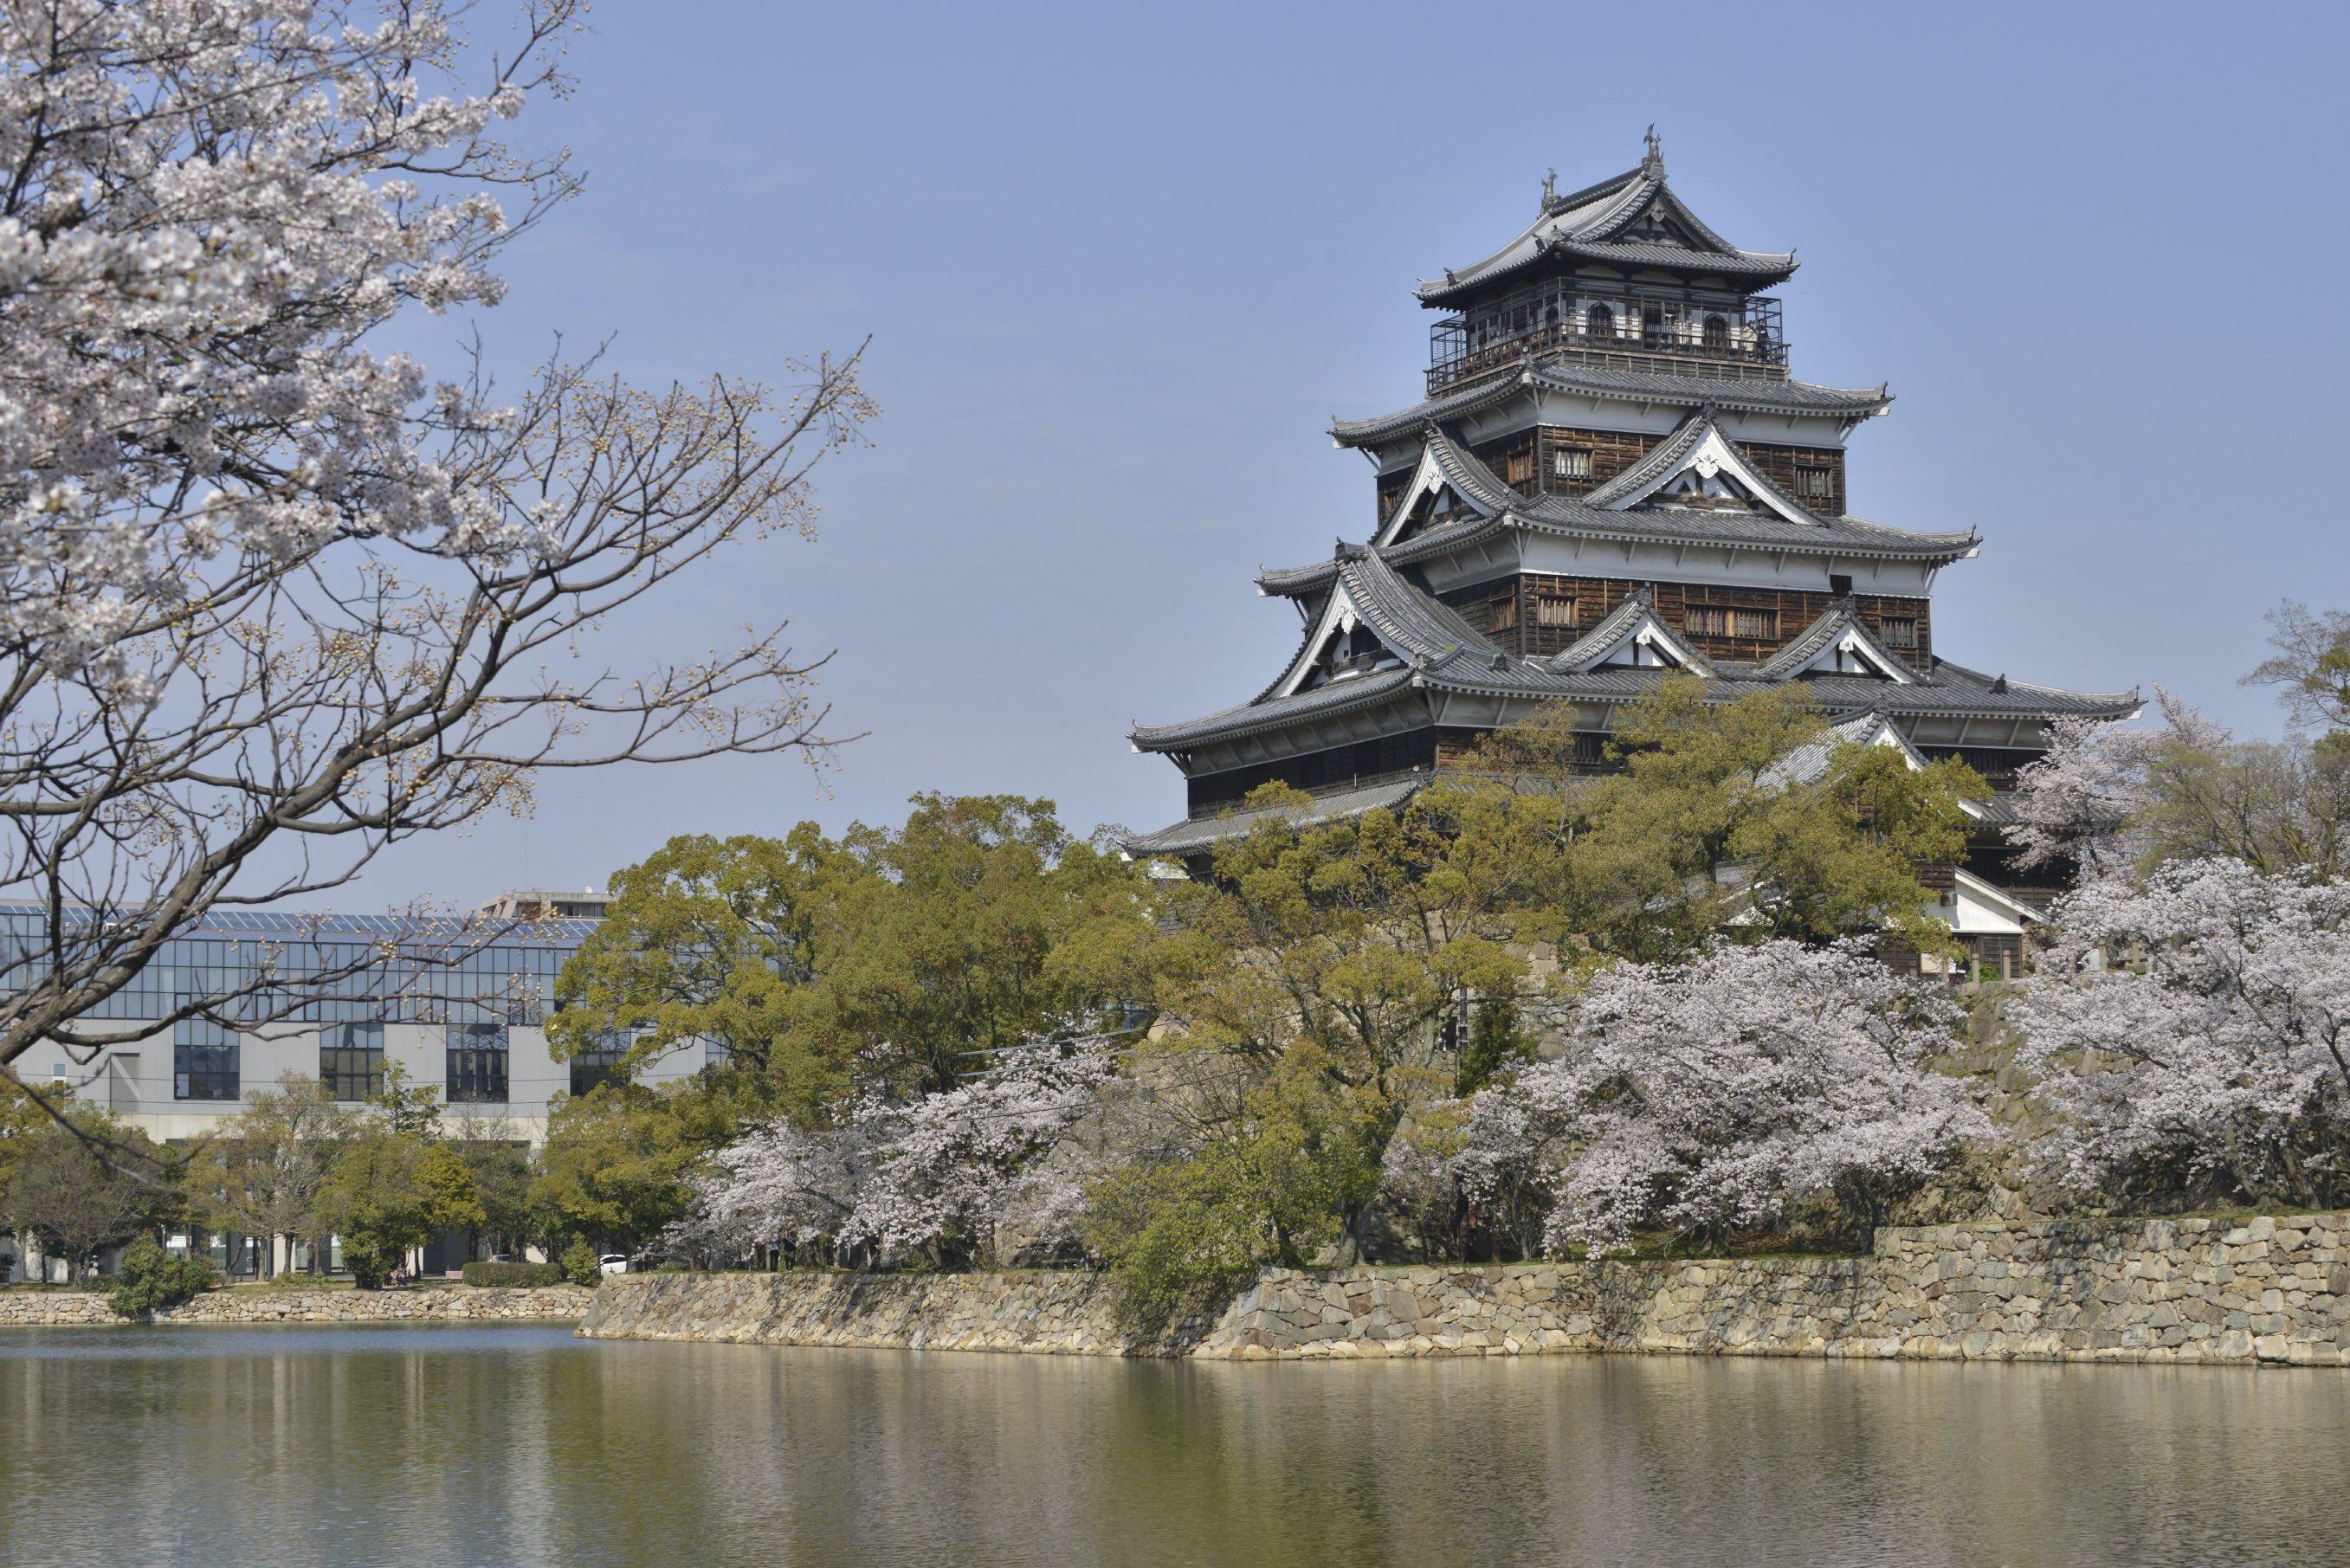 Hiroshima Castle is also known as 'Carp Castle'